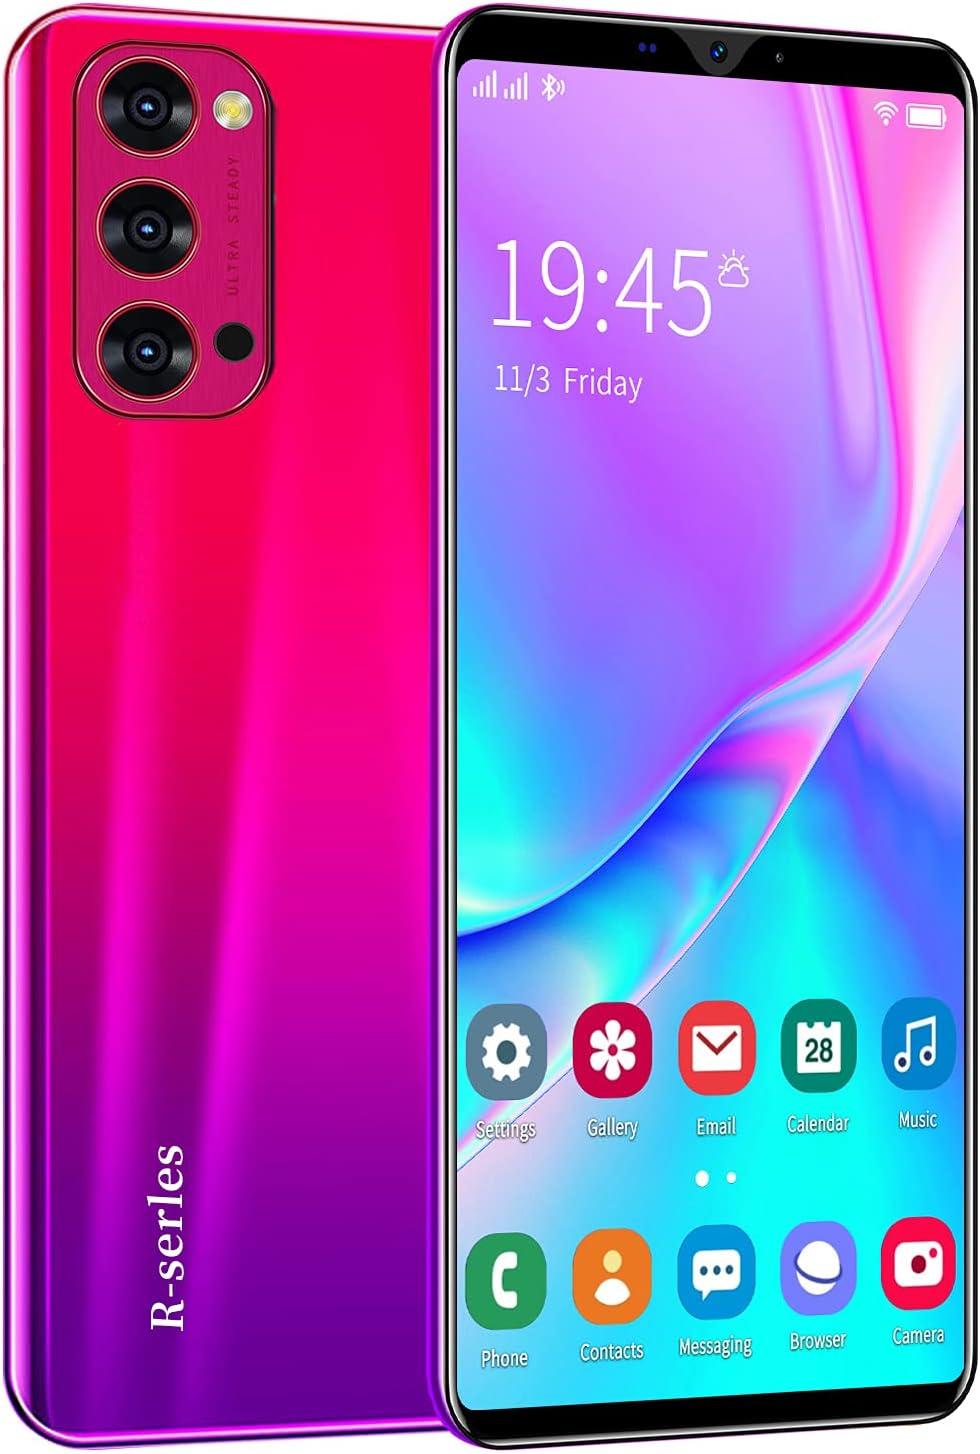 Teléfono Móvil Libre, ShaQx Rino4Pro Android 3G Smartphone Libre, 4GB ROM (32GB SD) Mobile Phone, 6.1